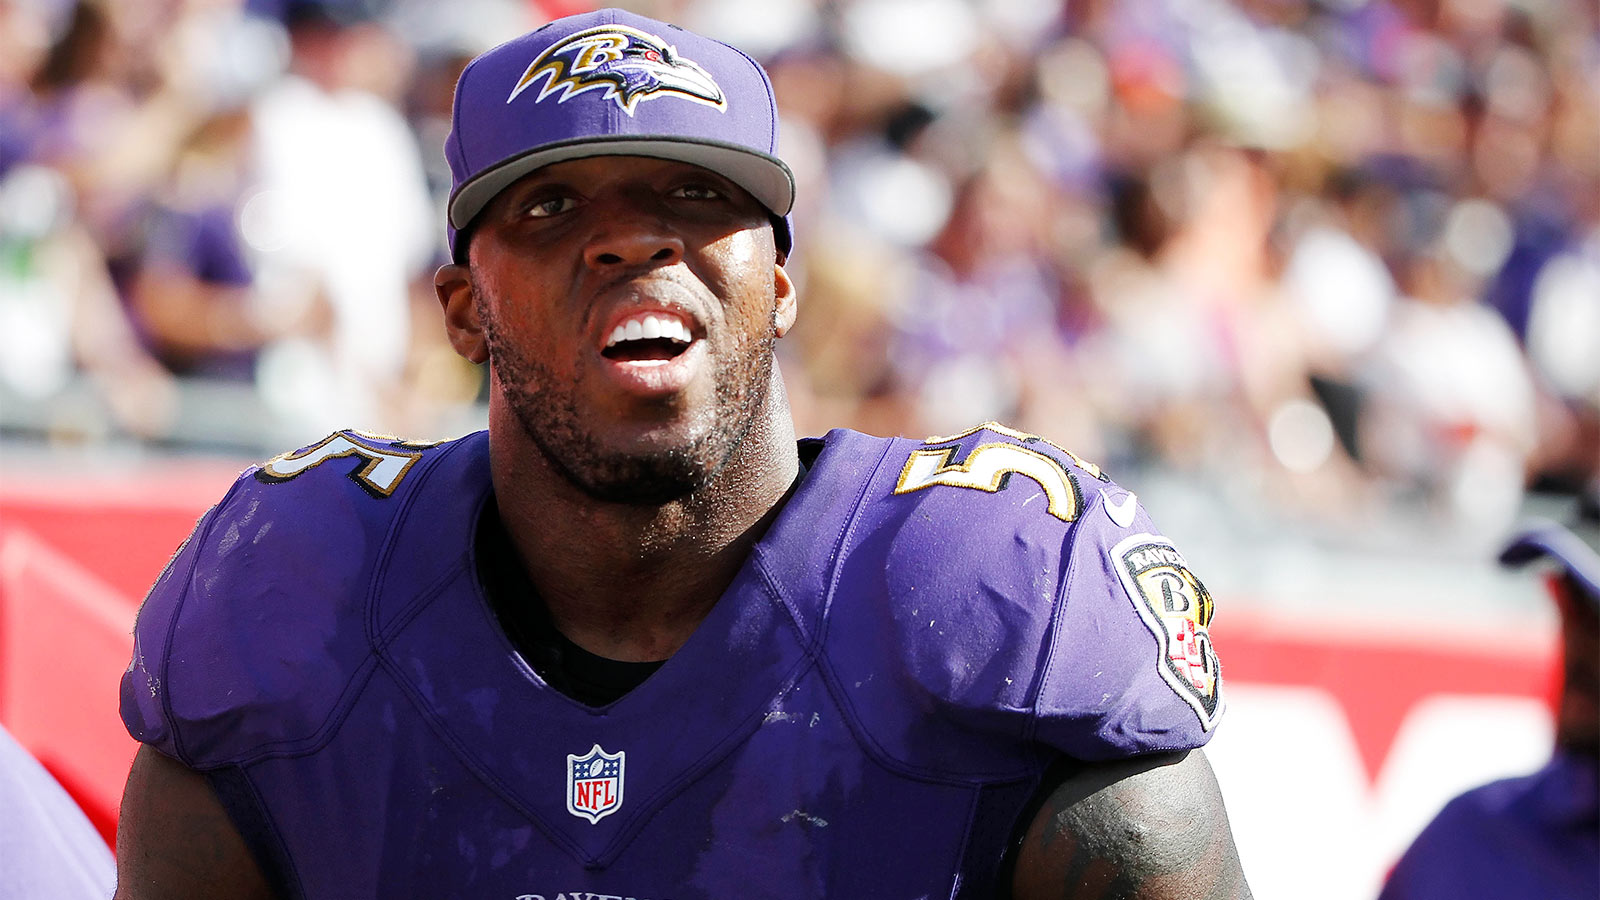 Ravens' Terrell Suggs continues to needle Matt Schaub